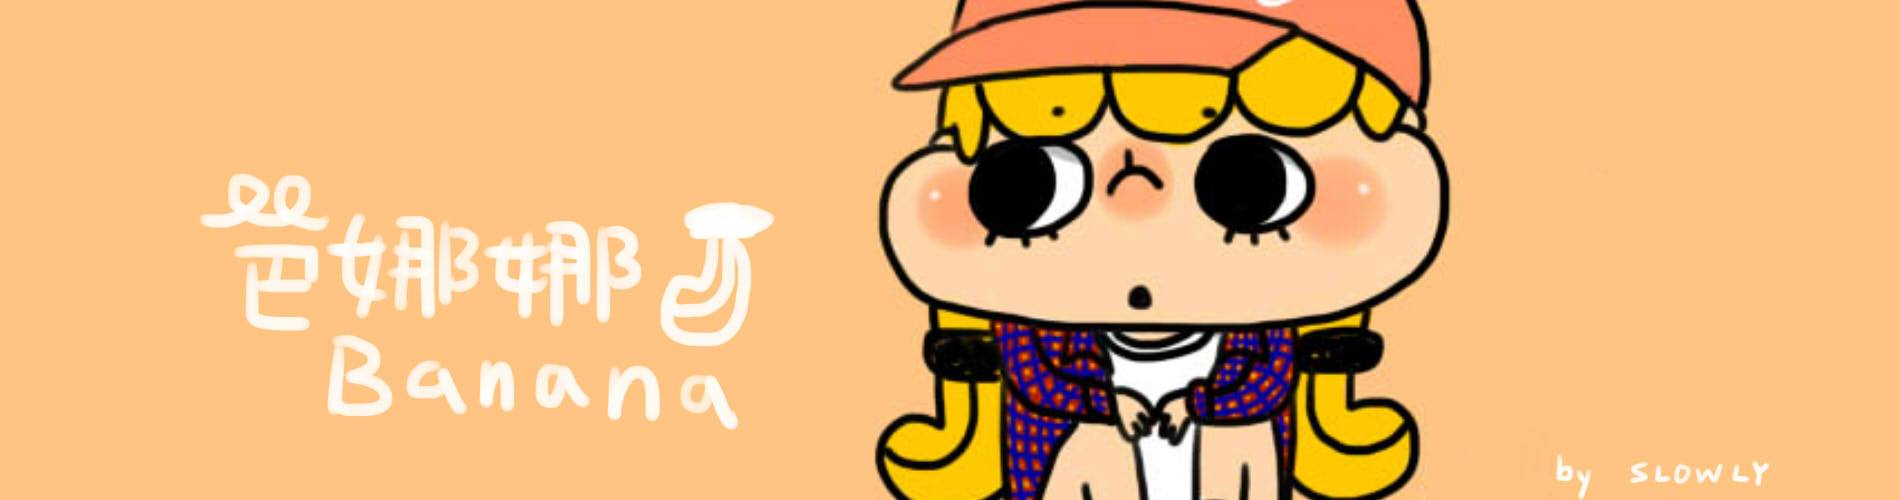 DESSERT365, 找手工甜甜網, 漫漫手工客製化市集, PrinXure, 拍洗社, 插畫家, 插畫角色, PrinXure, 芭娜娜